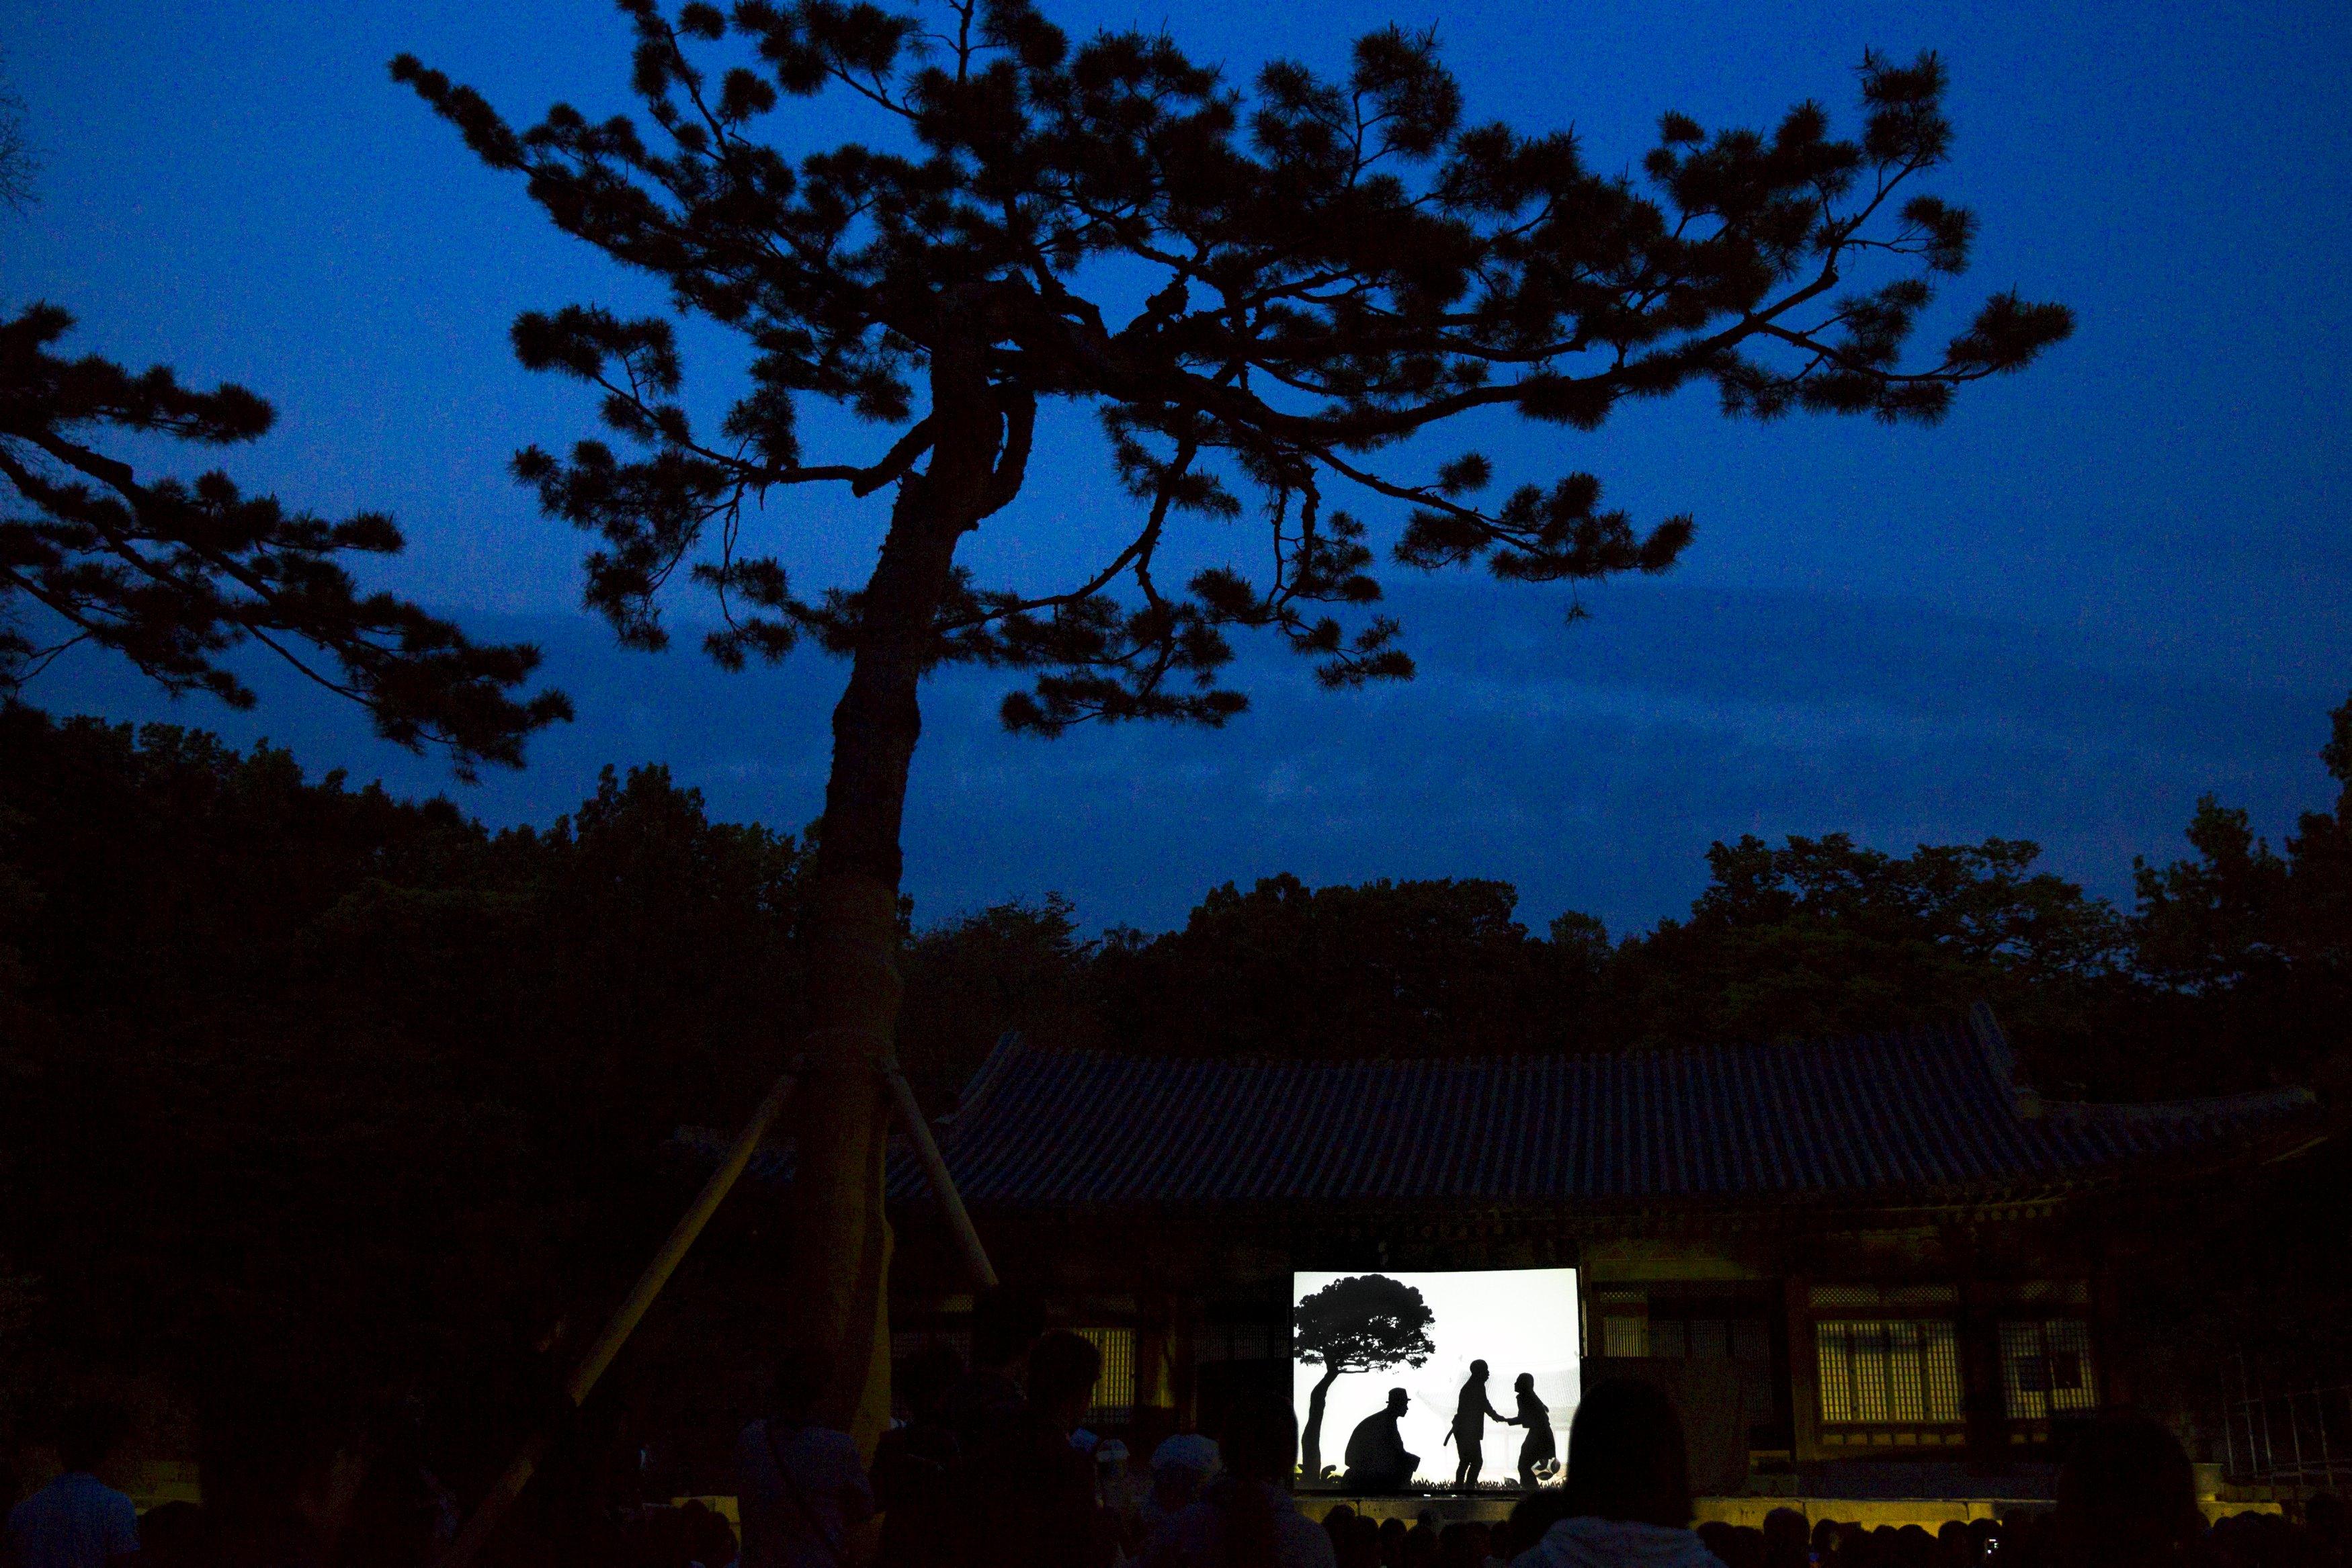 Penonton menyaksikan pertunjukkan wayang di Istana Changgyeonggung, Seoul, Korea Selatan, Rabu (6/5). ANTARA FOTO/REUTERS/Thomas Peter.